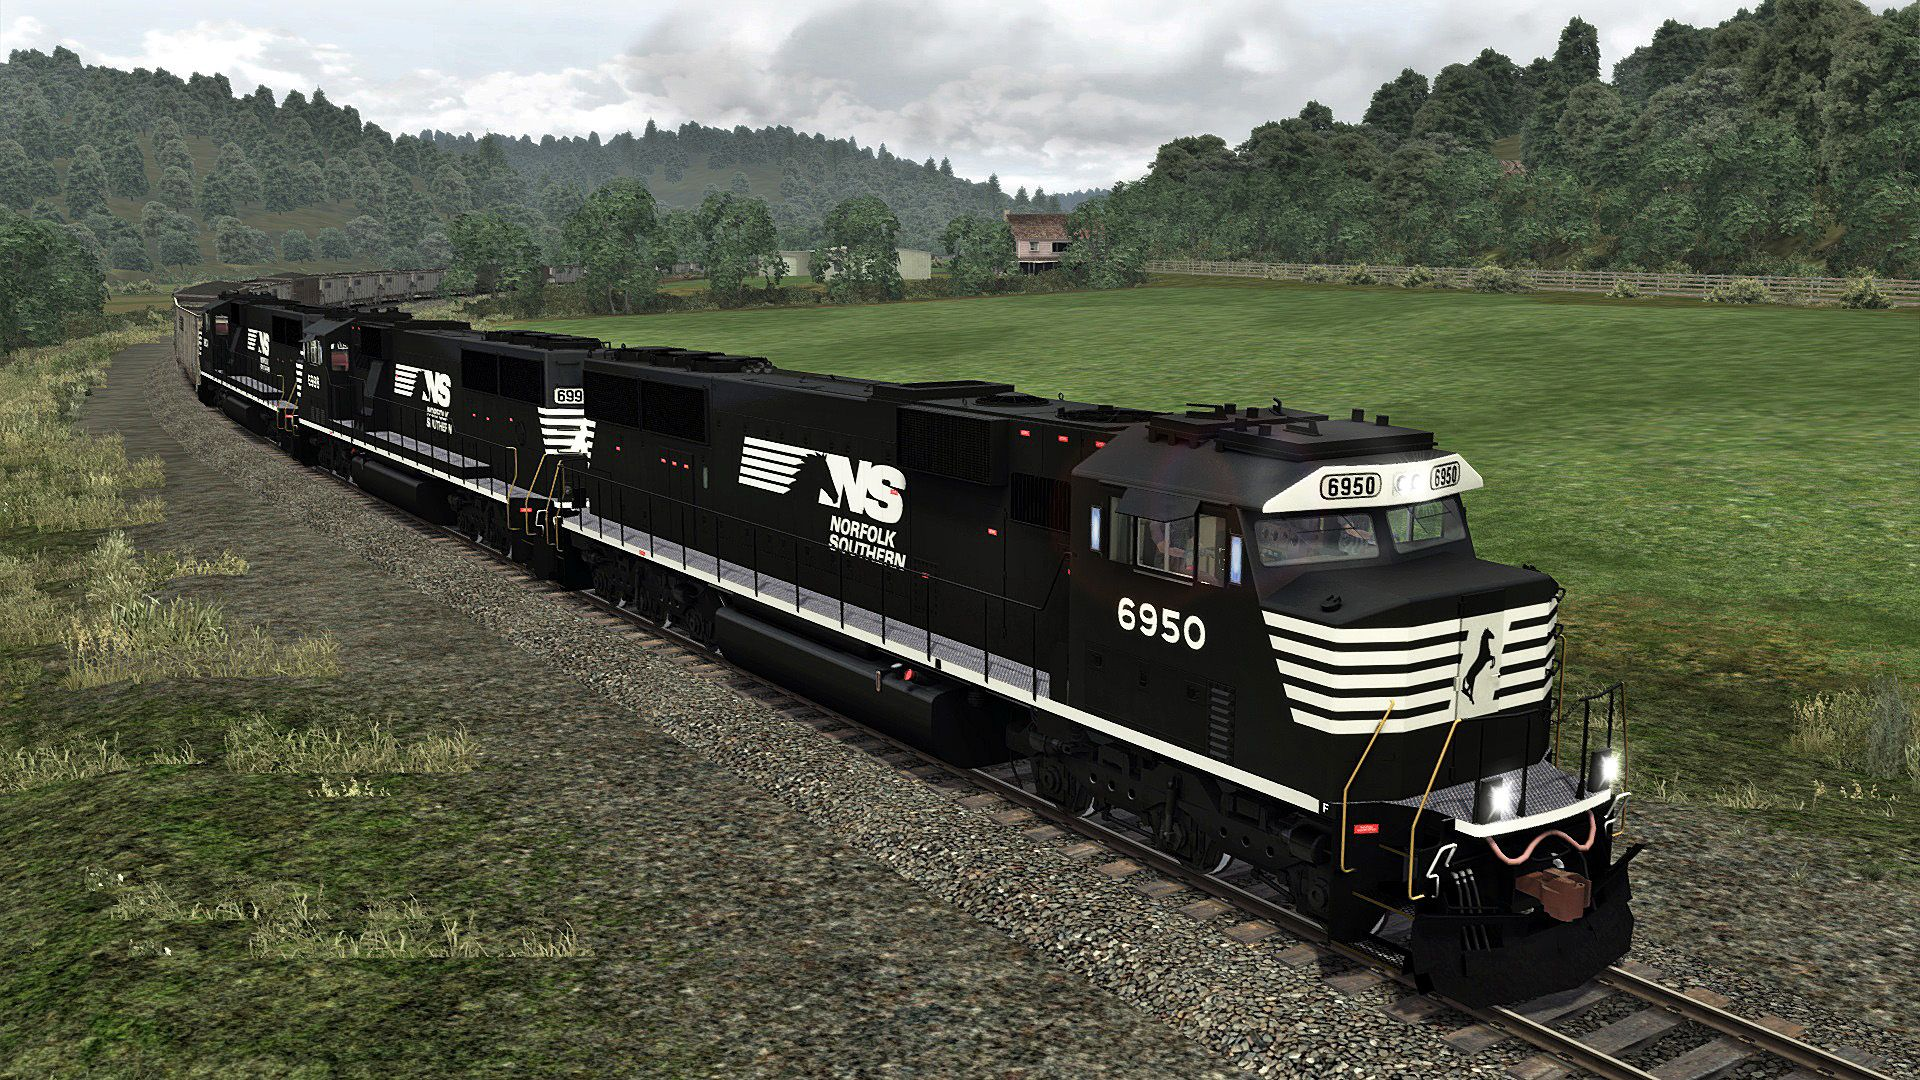 NSSD601